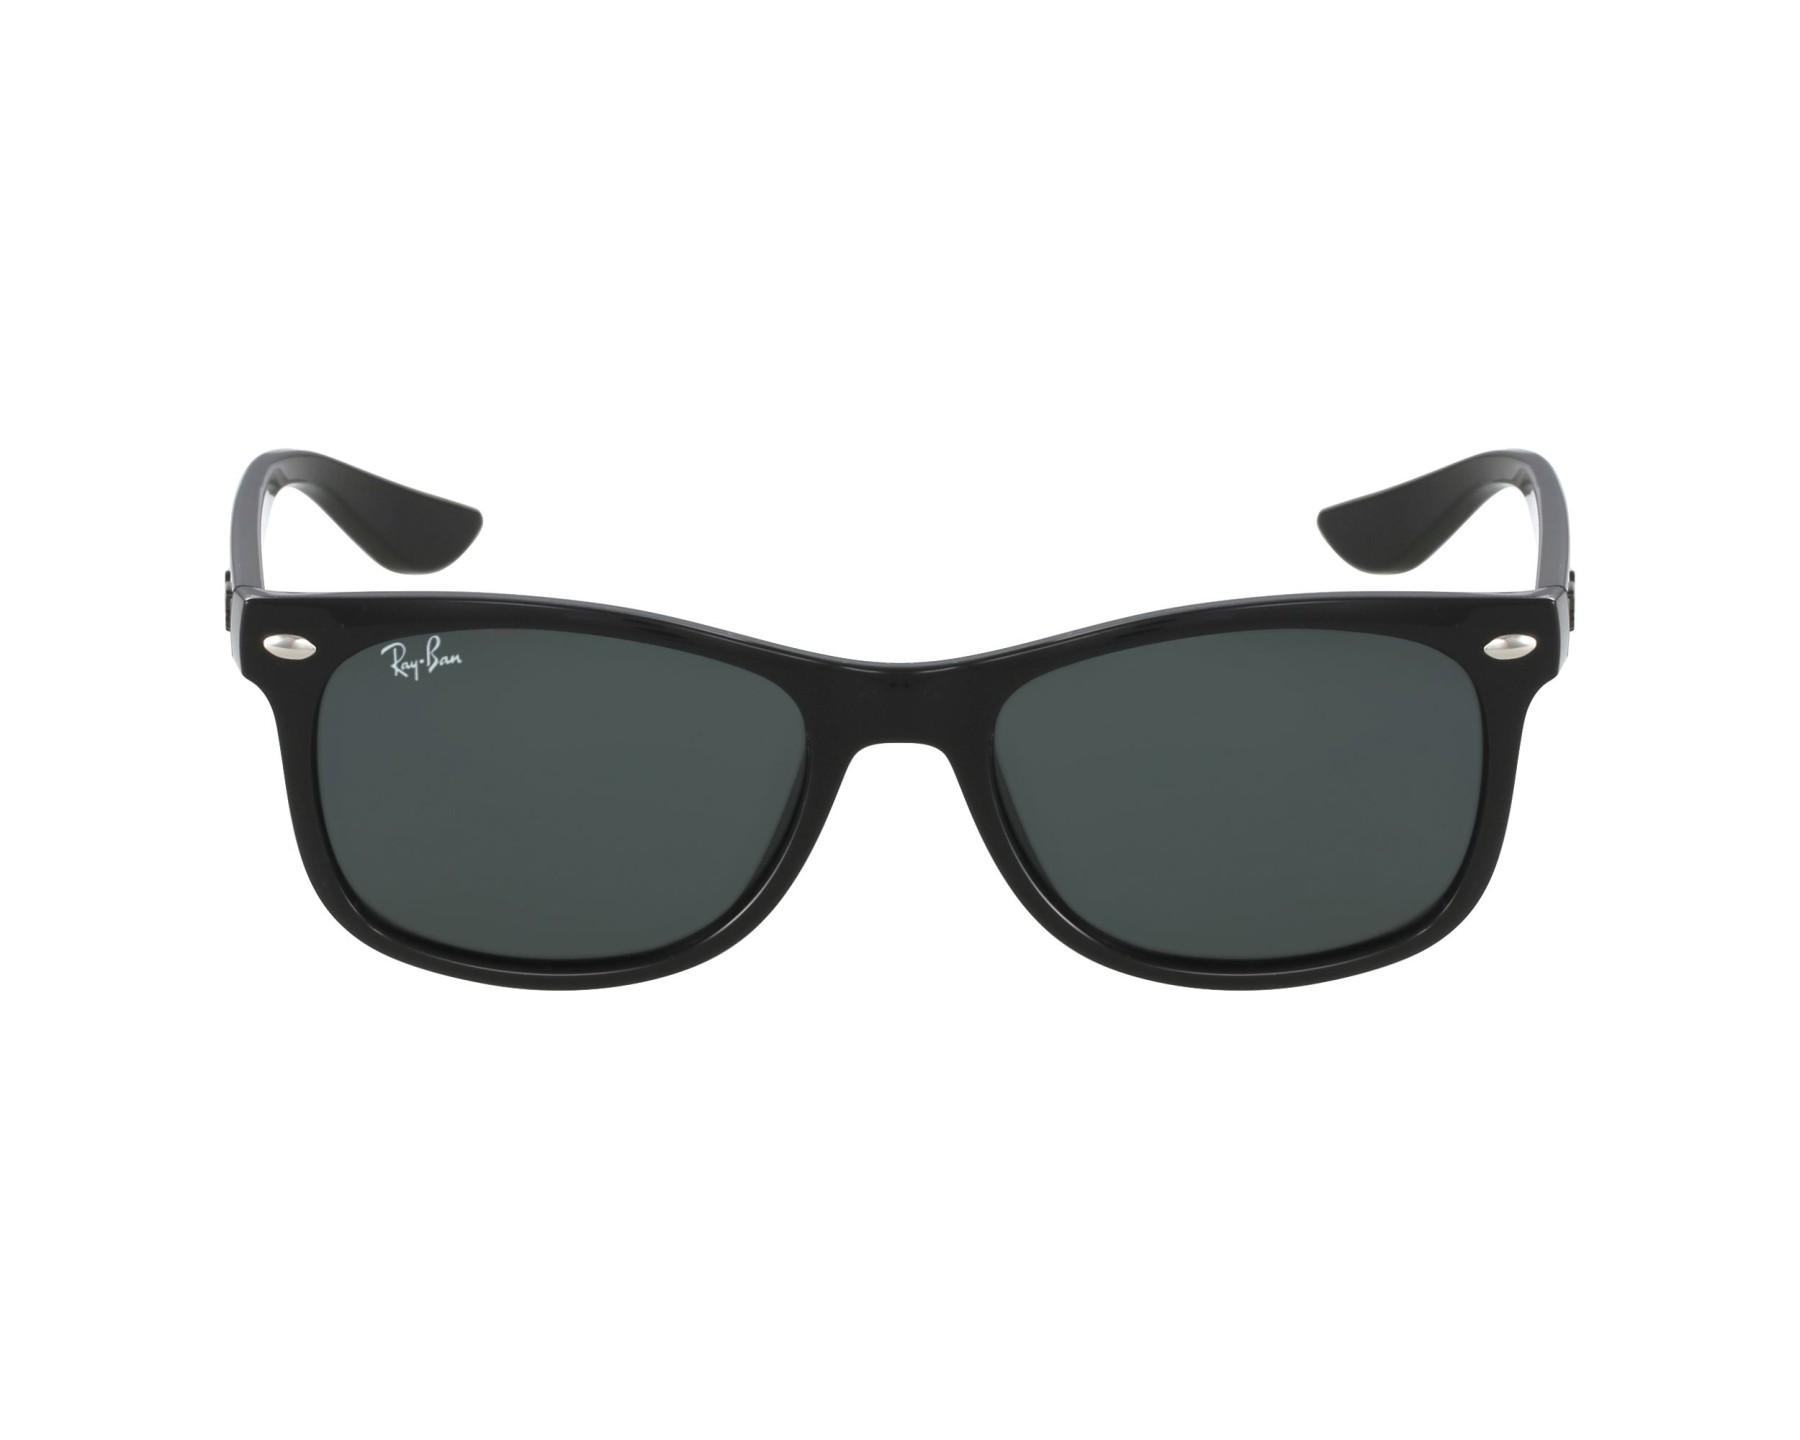 e99d6c23a48e Sunglasses Ray-Ban RJ-9052-S 100/71 - Black profile view